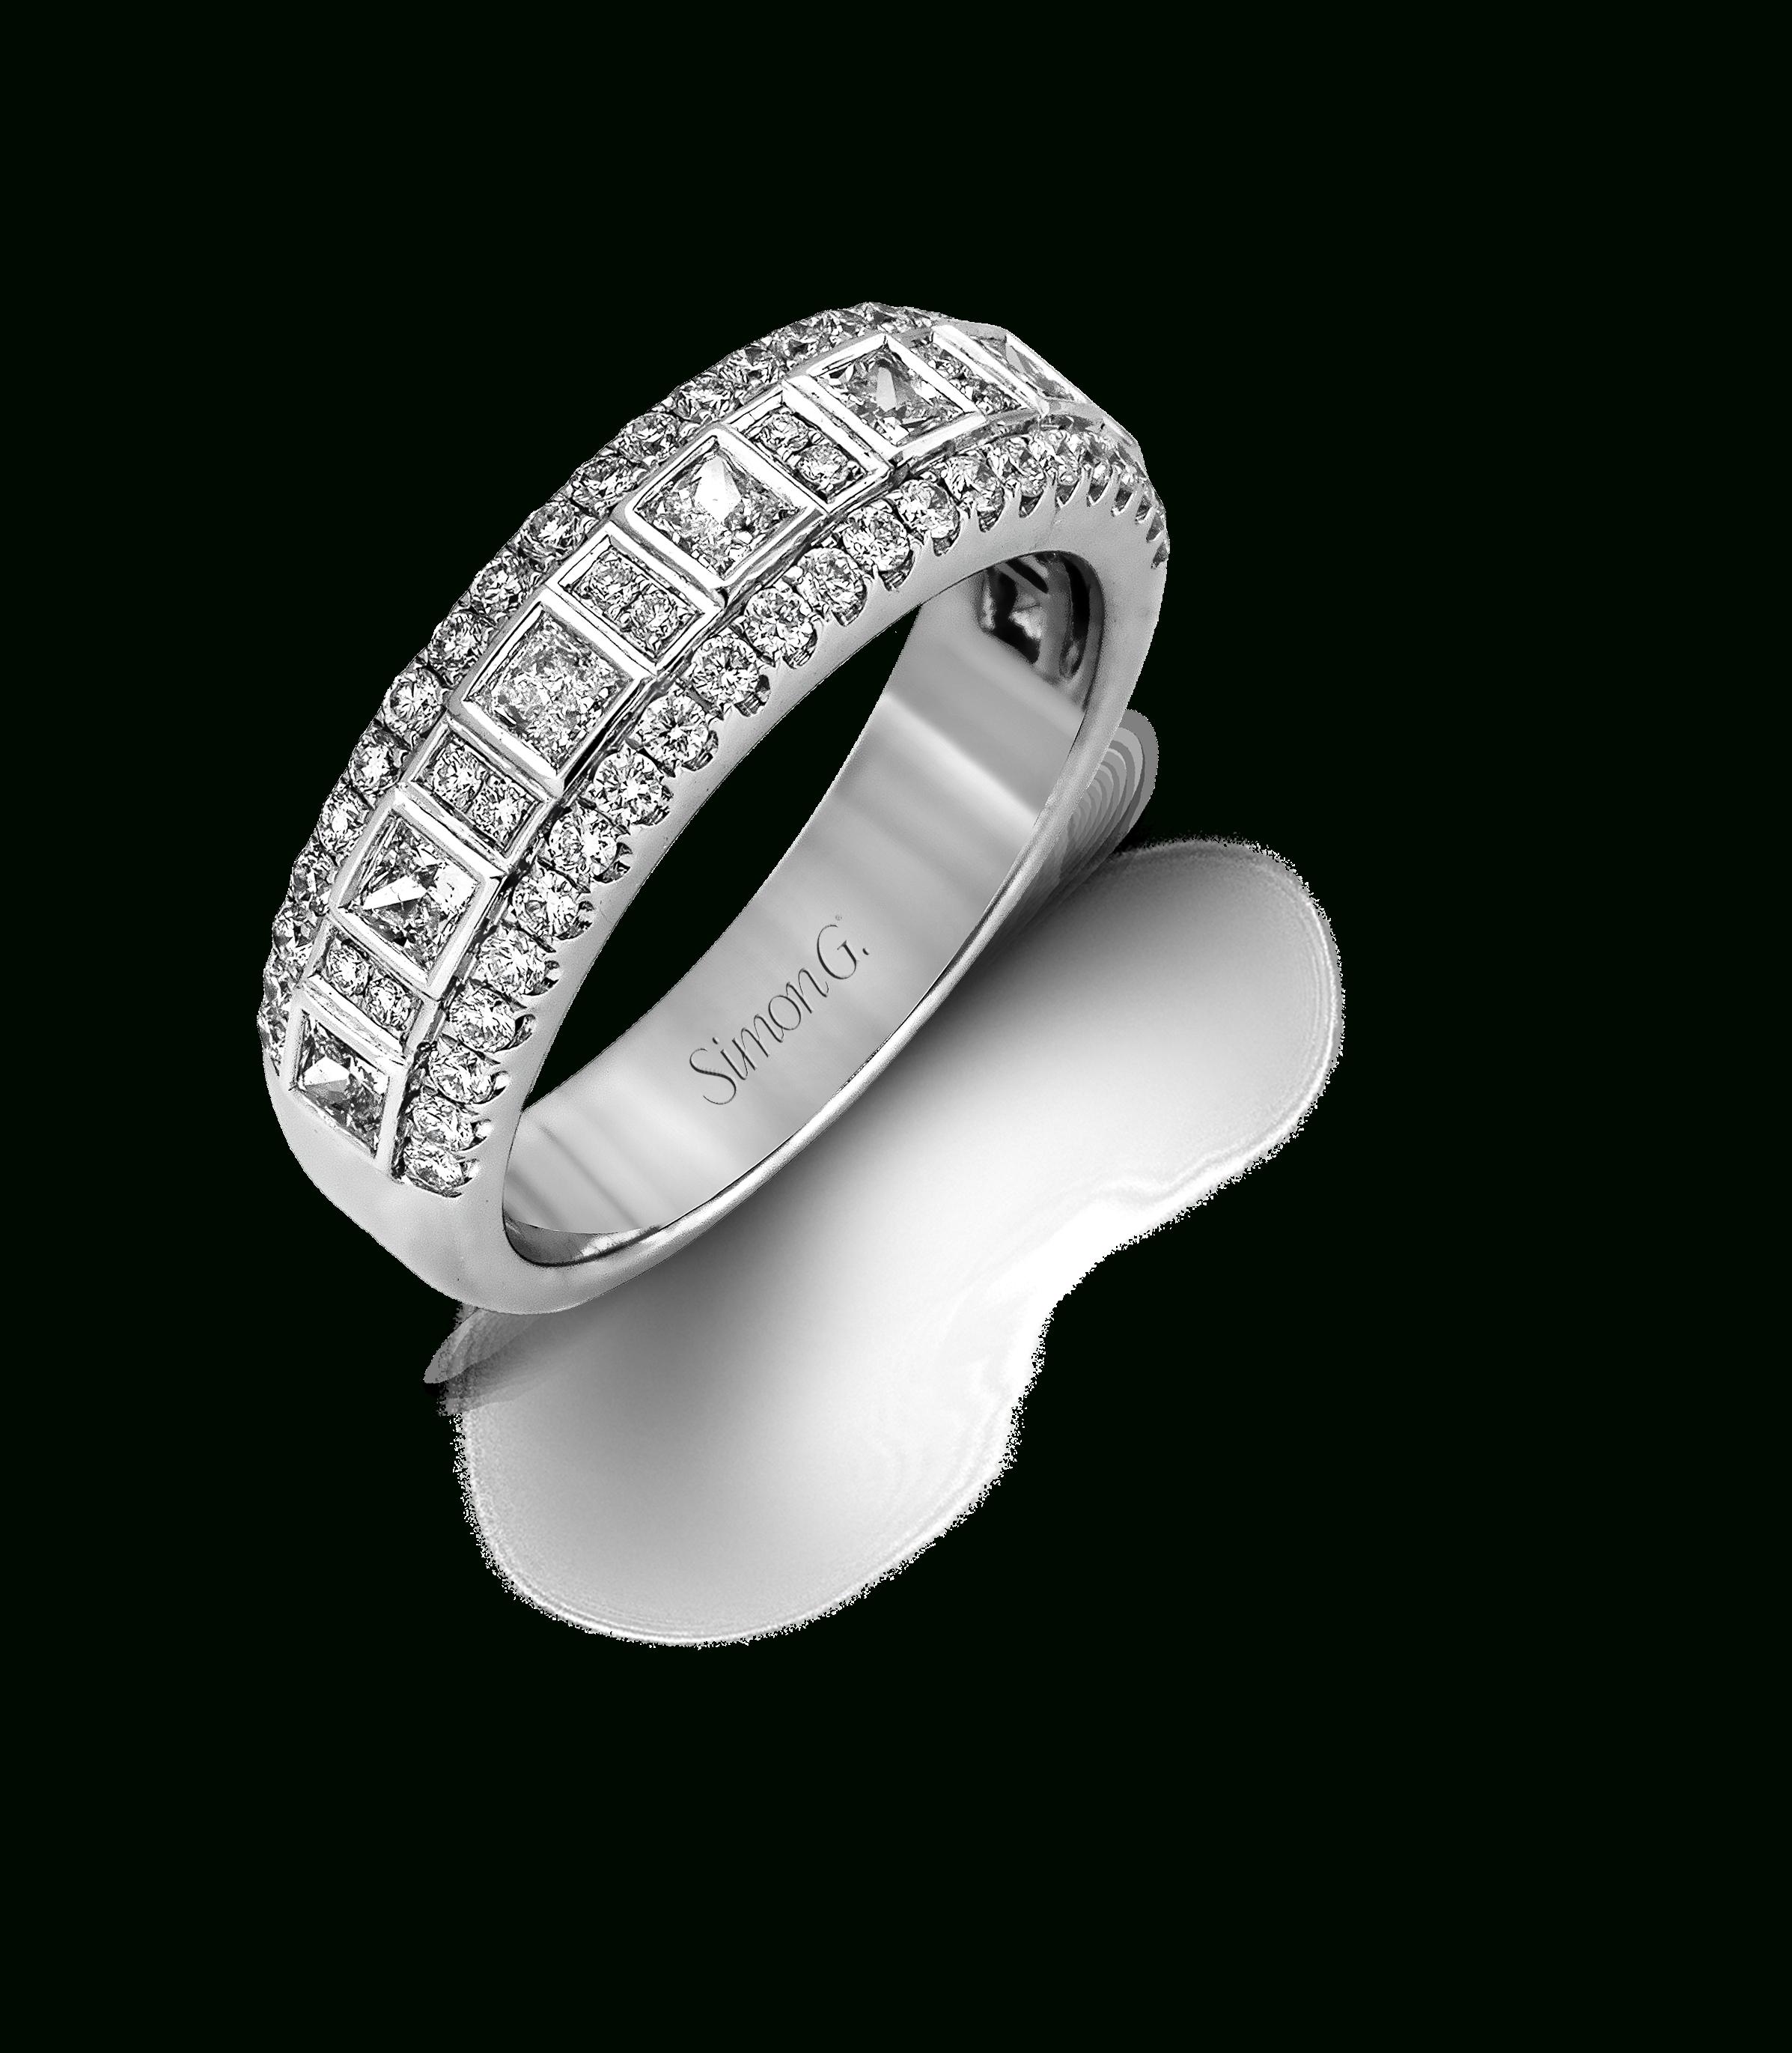 50Th Wedding Anniversary Diamond Rings Plus Anniversary Diamond In Most Recent Wedding And Anniversary Rings (View 3 of 25)